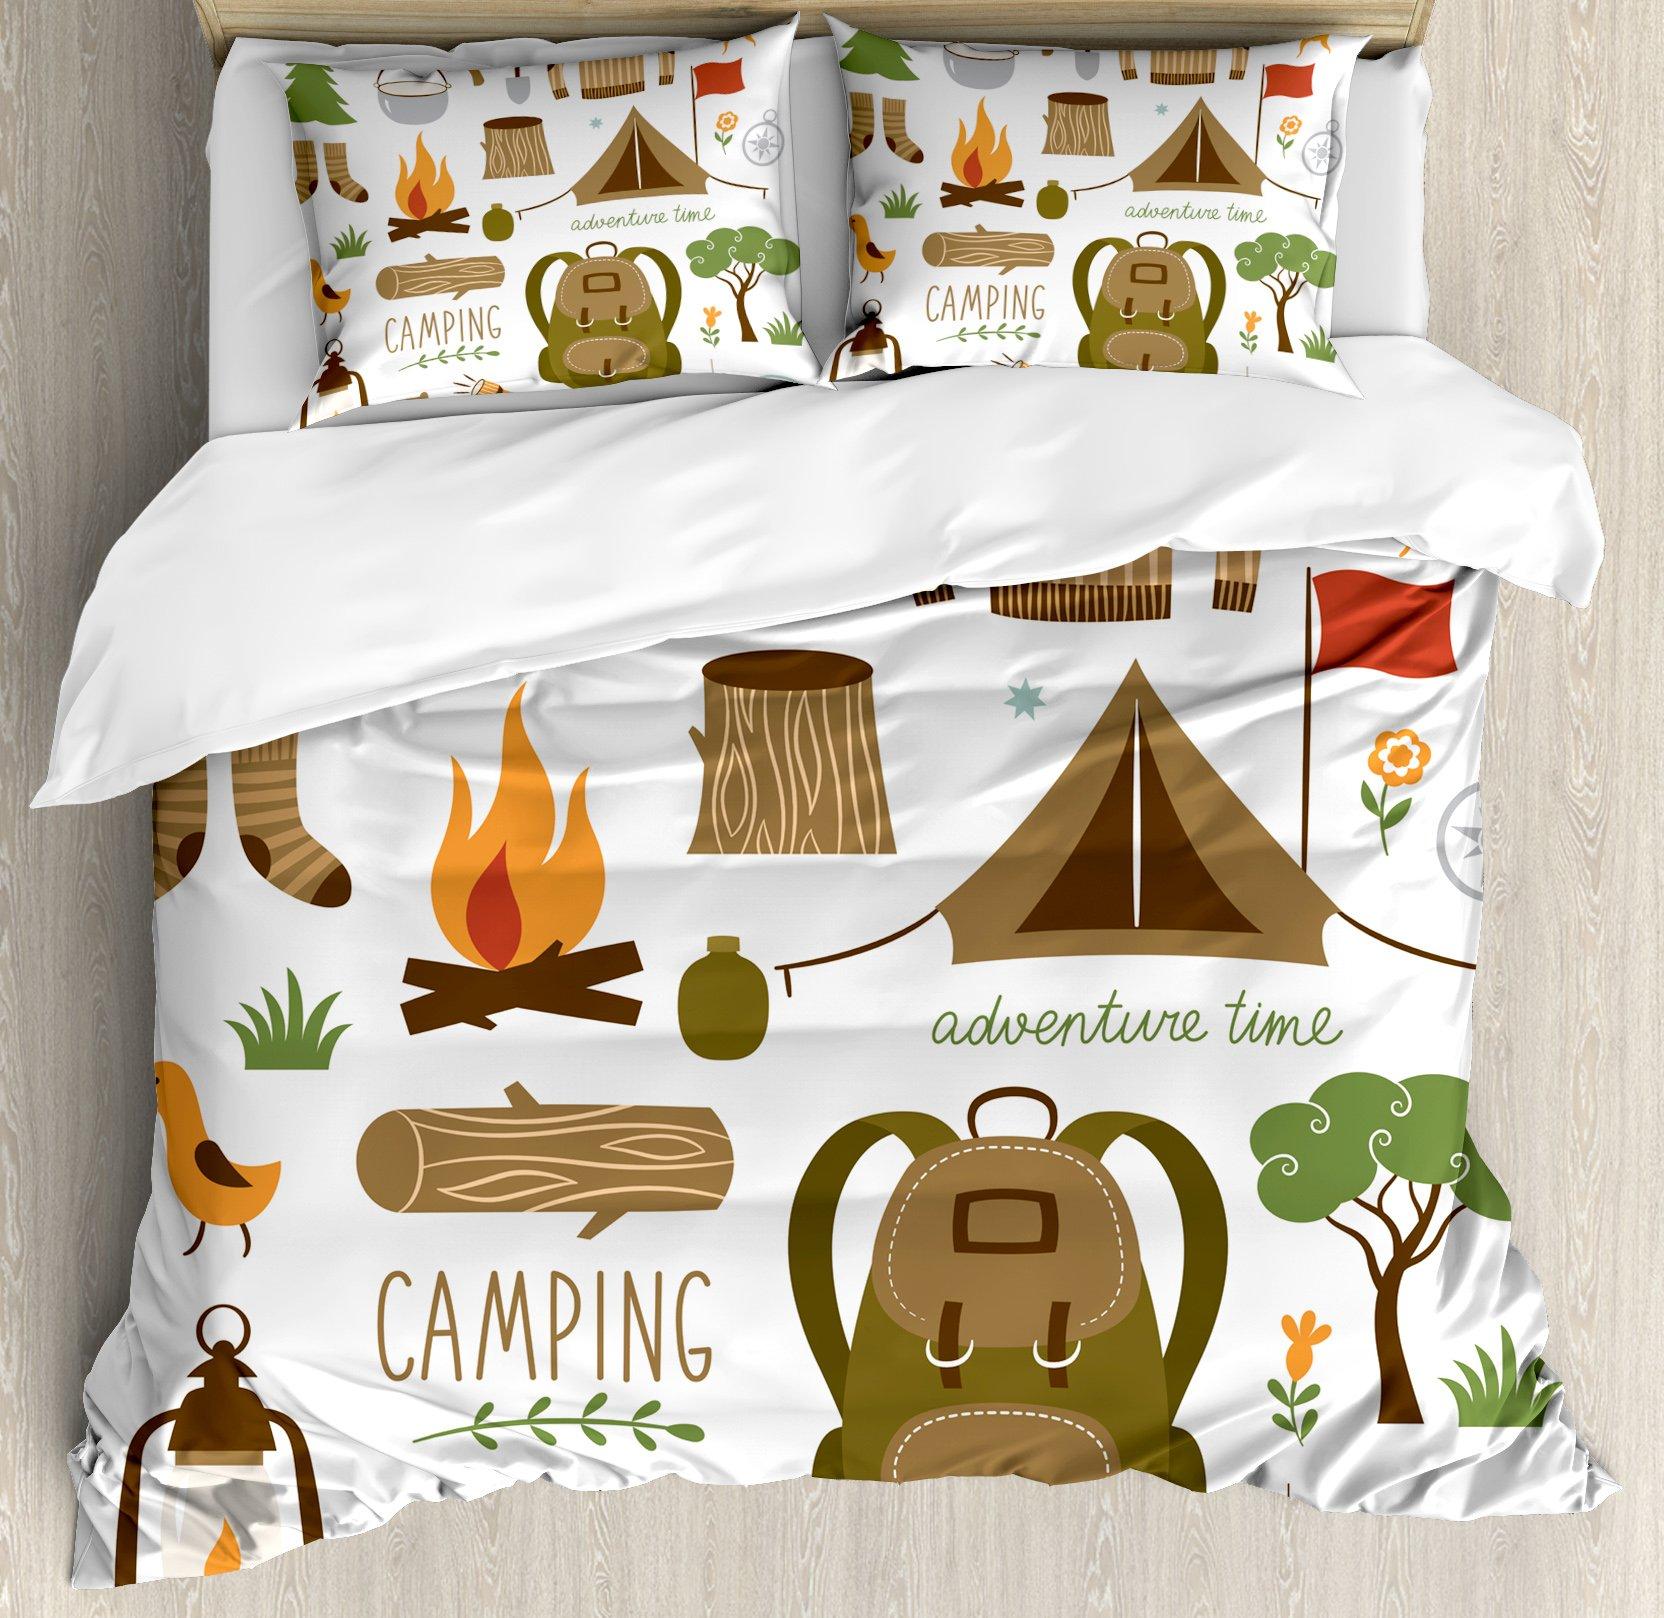 Ambesonne Adventure Duvet Cover Set Queen Size, Camping Equipment Sleeping Bag Boots Campfire Shovel Hatchet Log Artwork Print, Decorative 3 Piece Bedding Set with 2 Pillow Shams, Multicolor